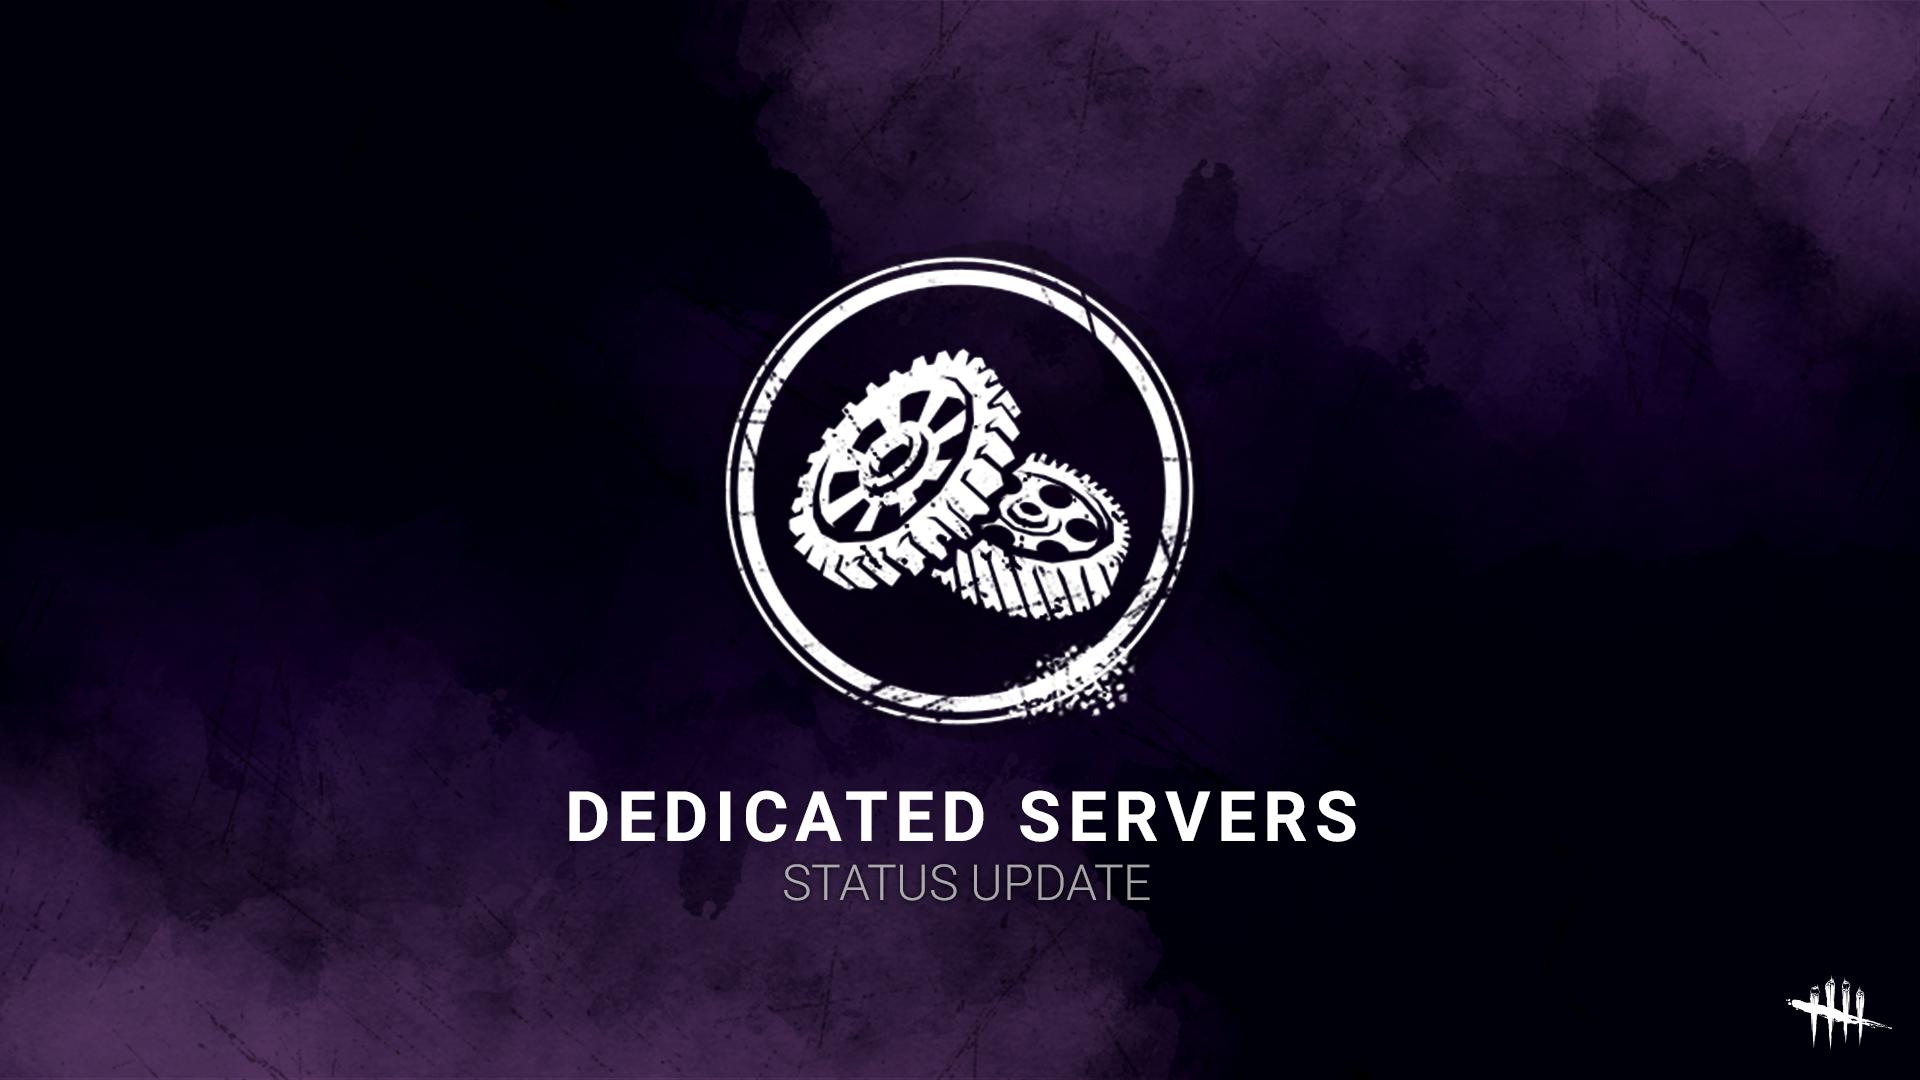 Dedicated server bandwidth unlimited j